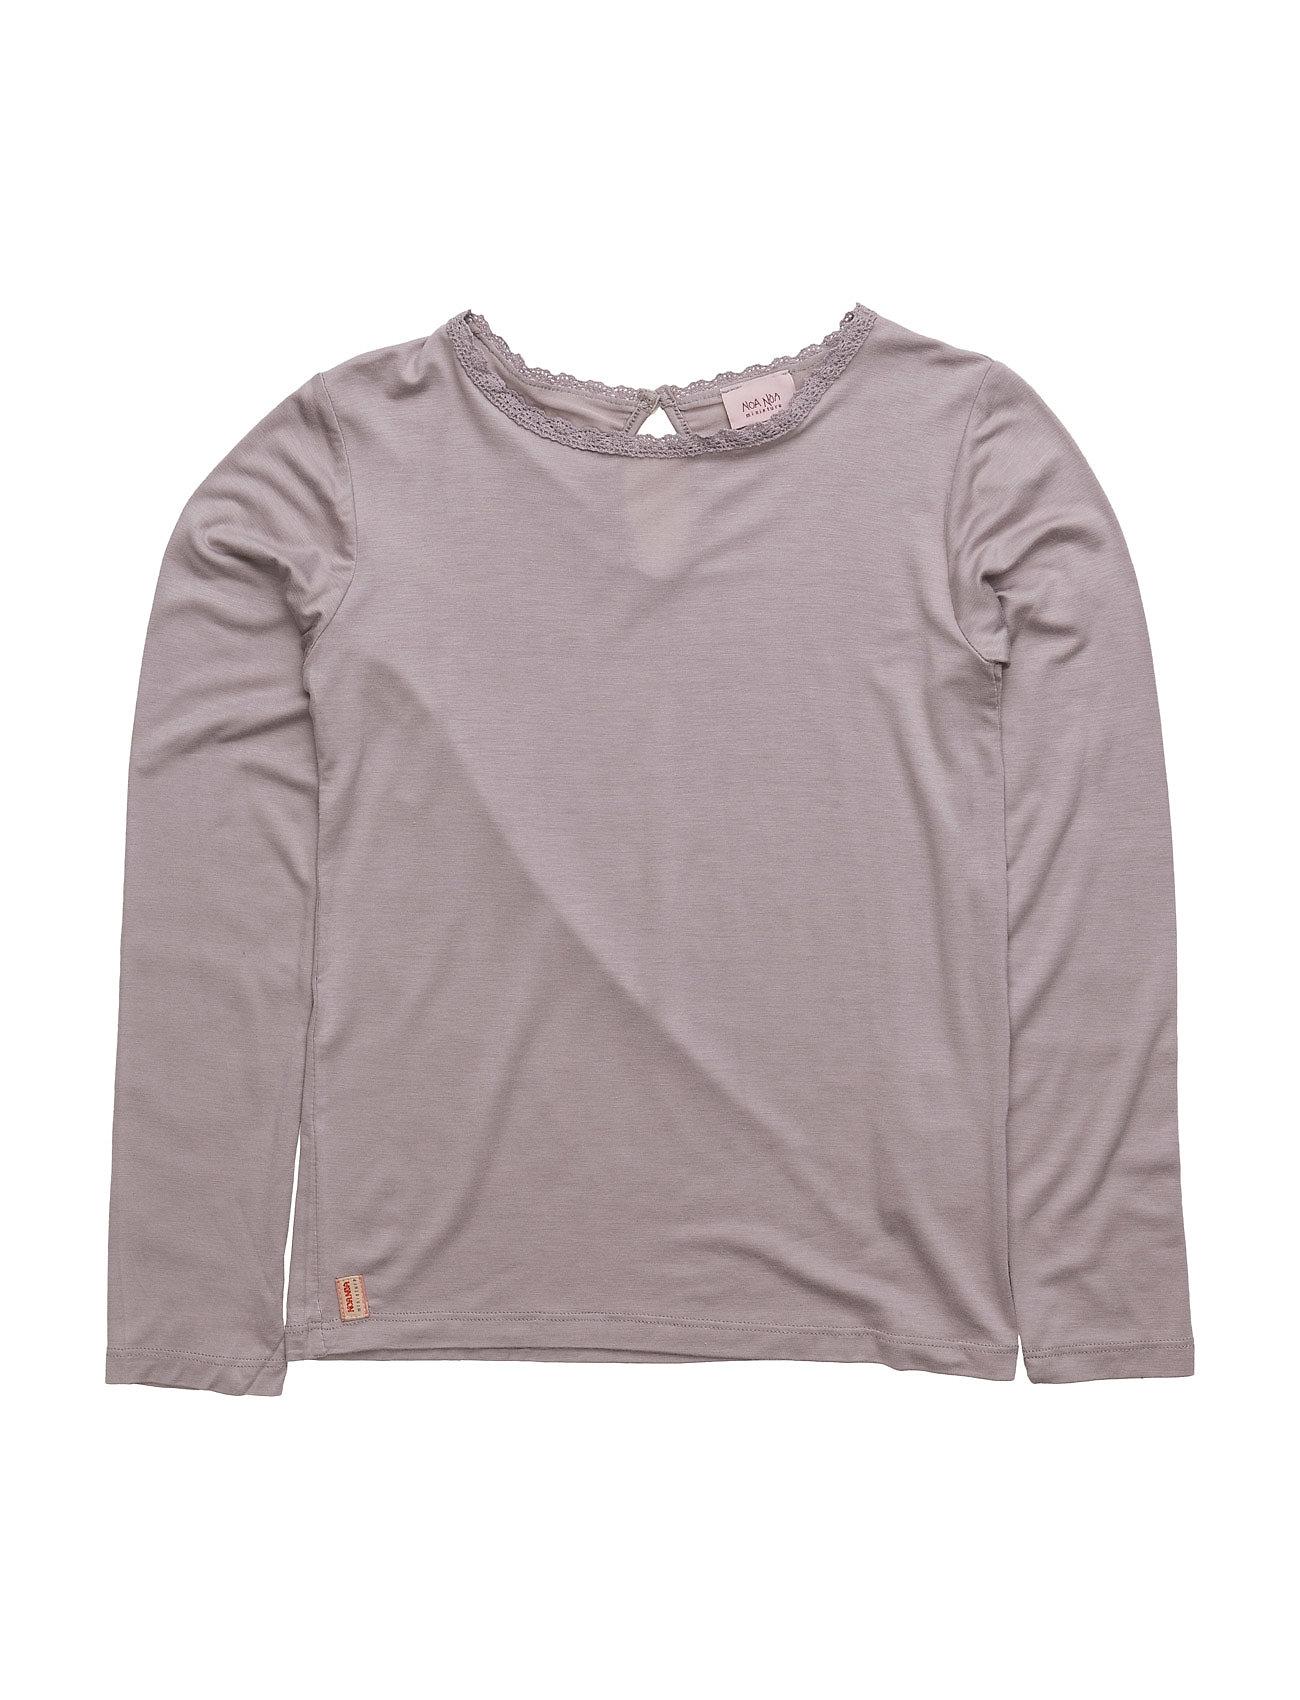 Tuffa T-Shirt Noa Noa Miniature Sleeve T-Shirts till Barn i skönt ... 4da75f1c9a2e3